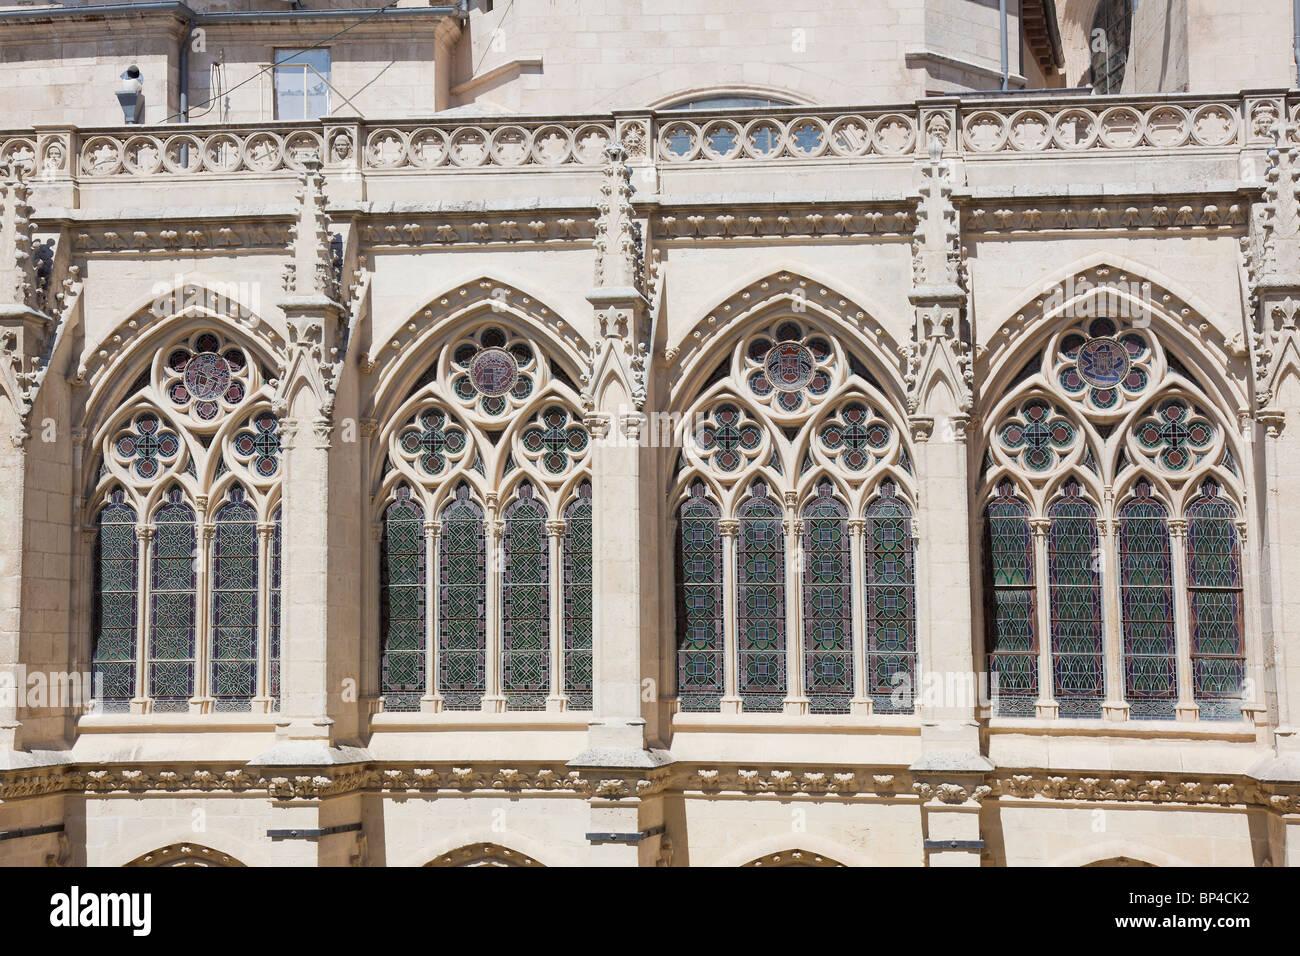 Windows of the cathedral of Burgos, Castilla y Leon, Spain - Stock Image